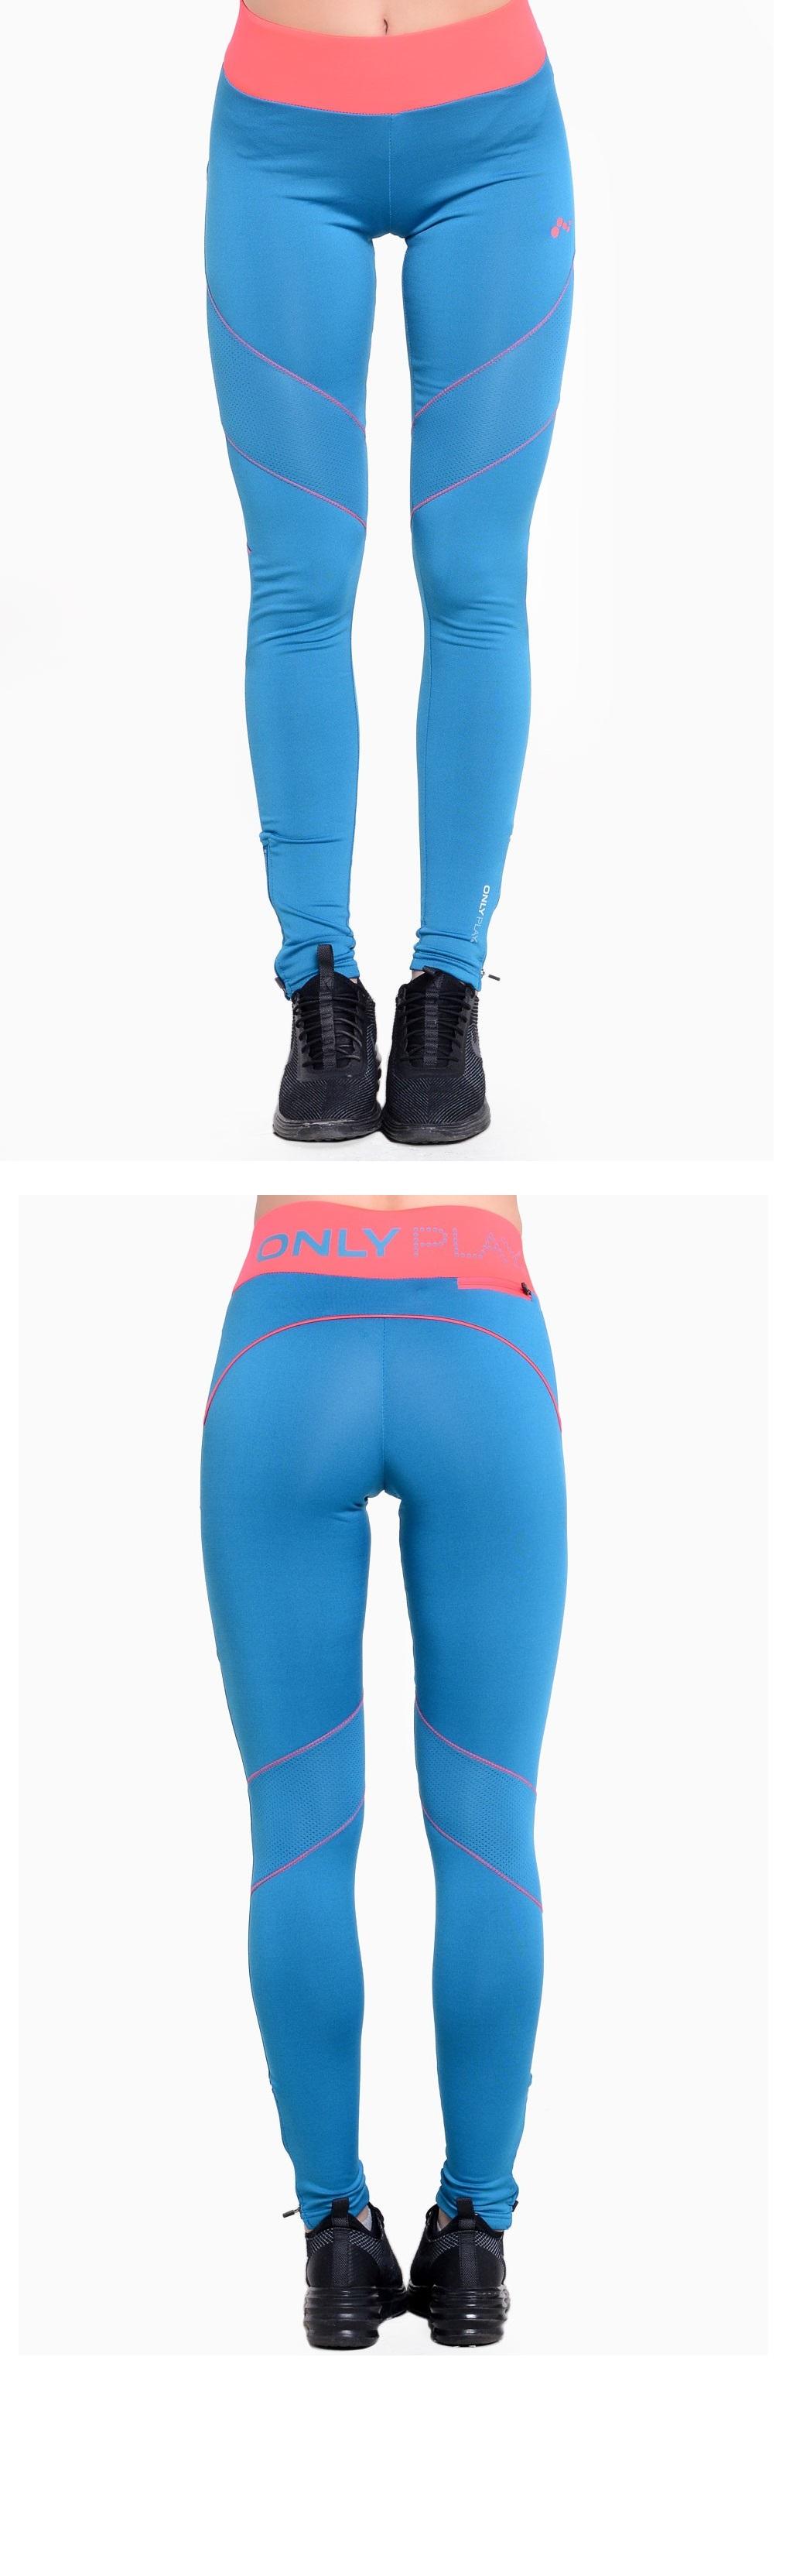 leggings donna azzurri